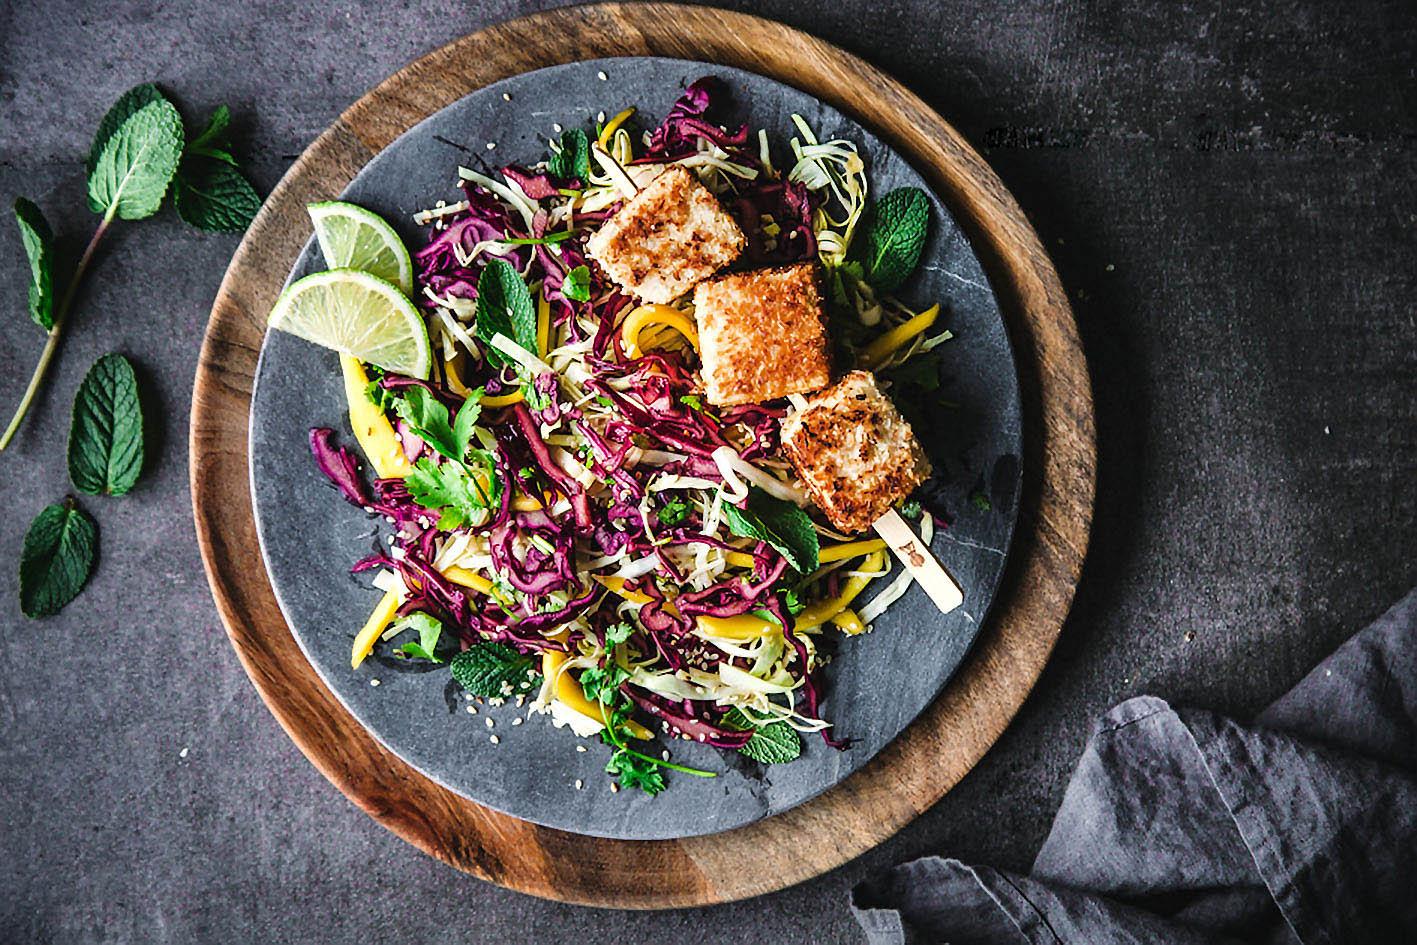 Bunter Rotkohlsalat mit knusprigem Tofu